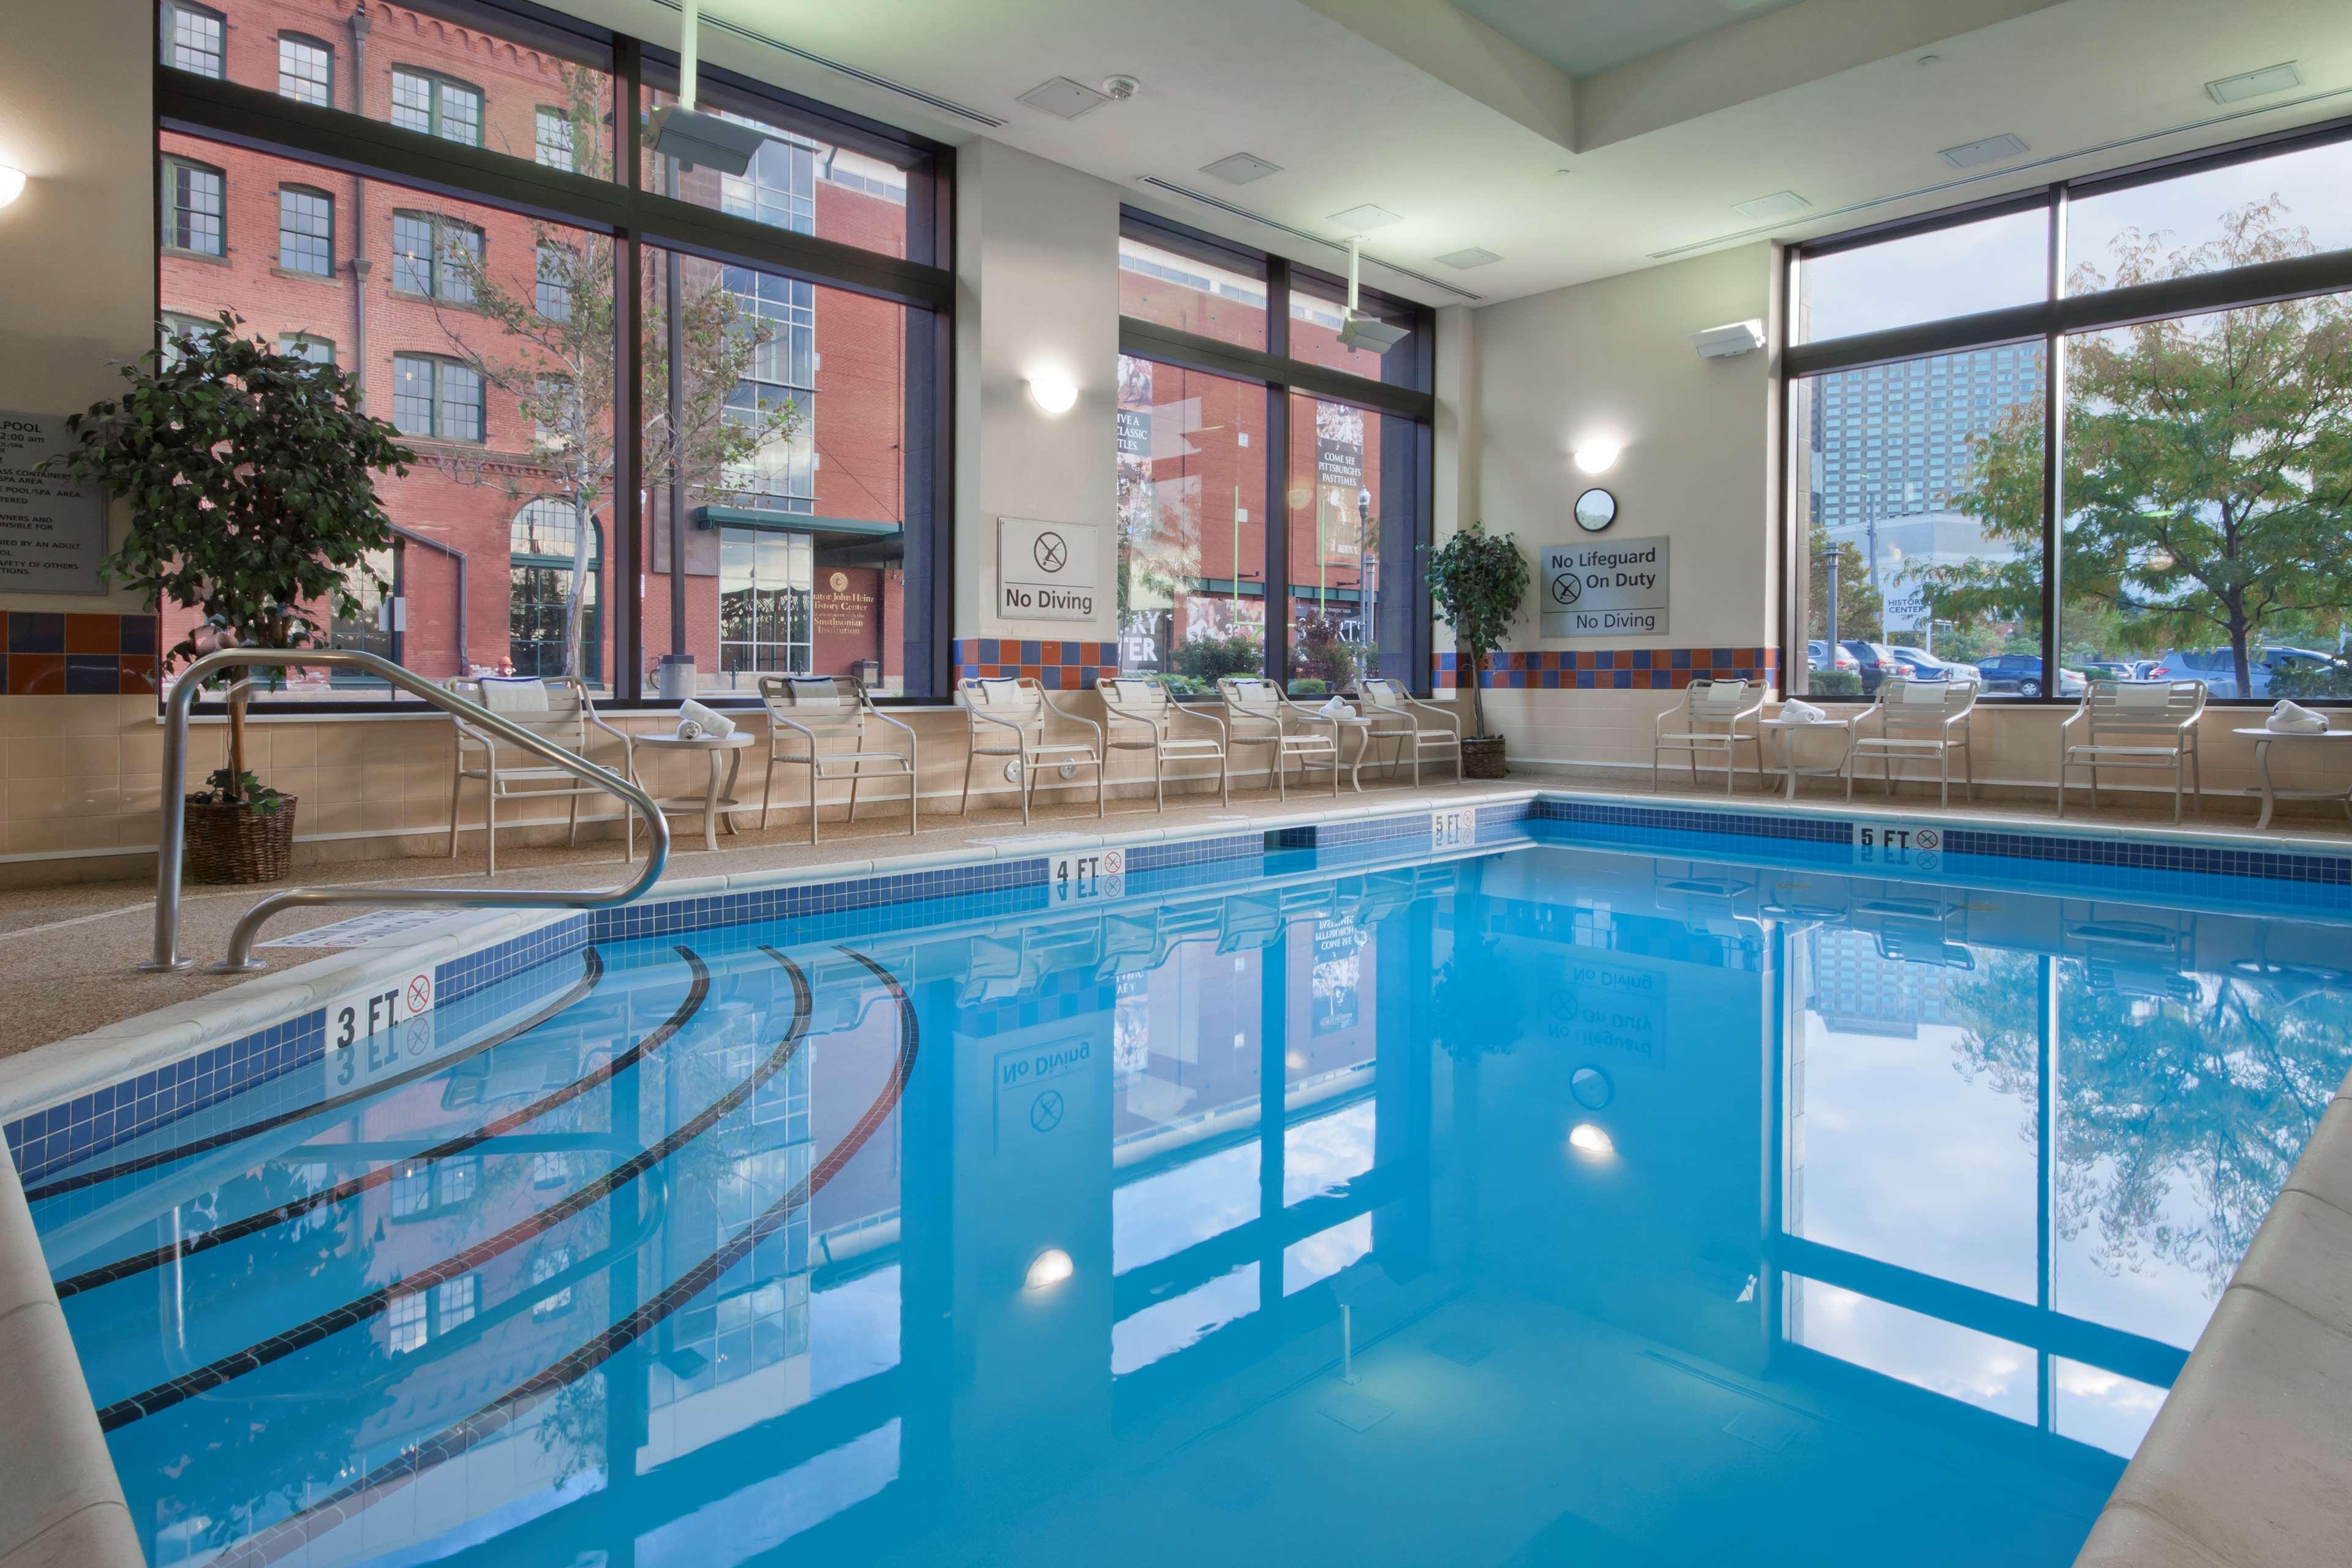 Hampton Inn & Suites Pittsburgh-Downtown image 8